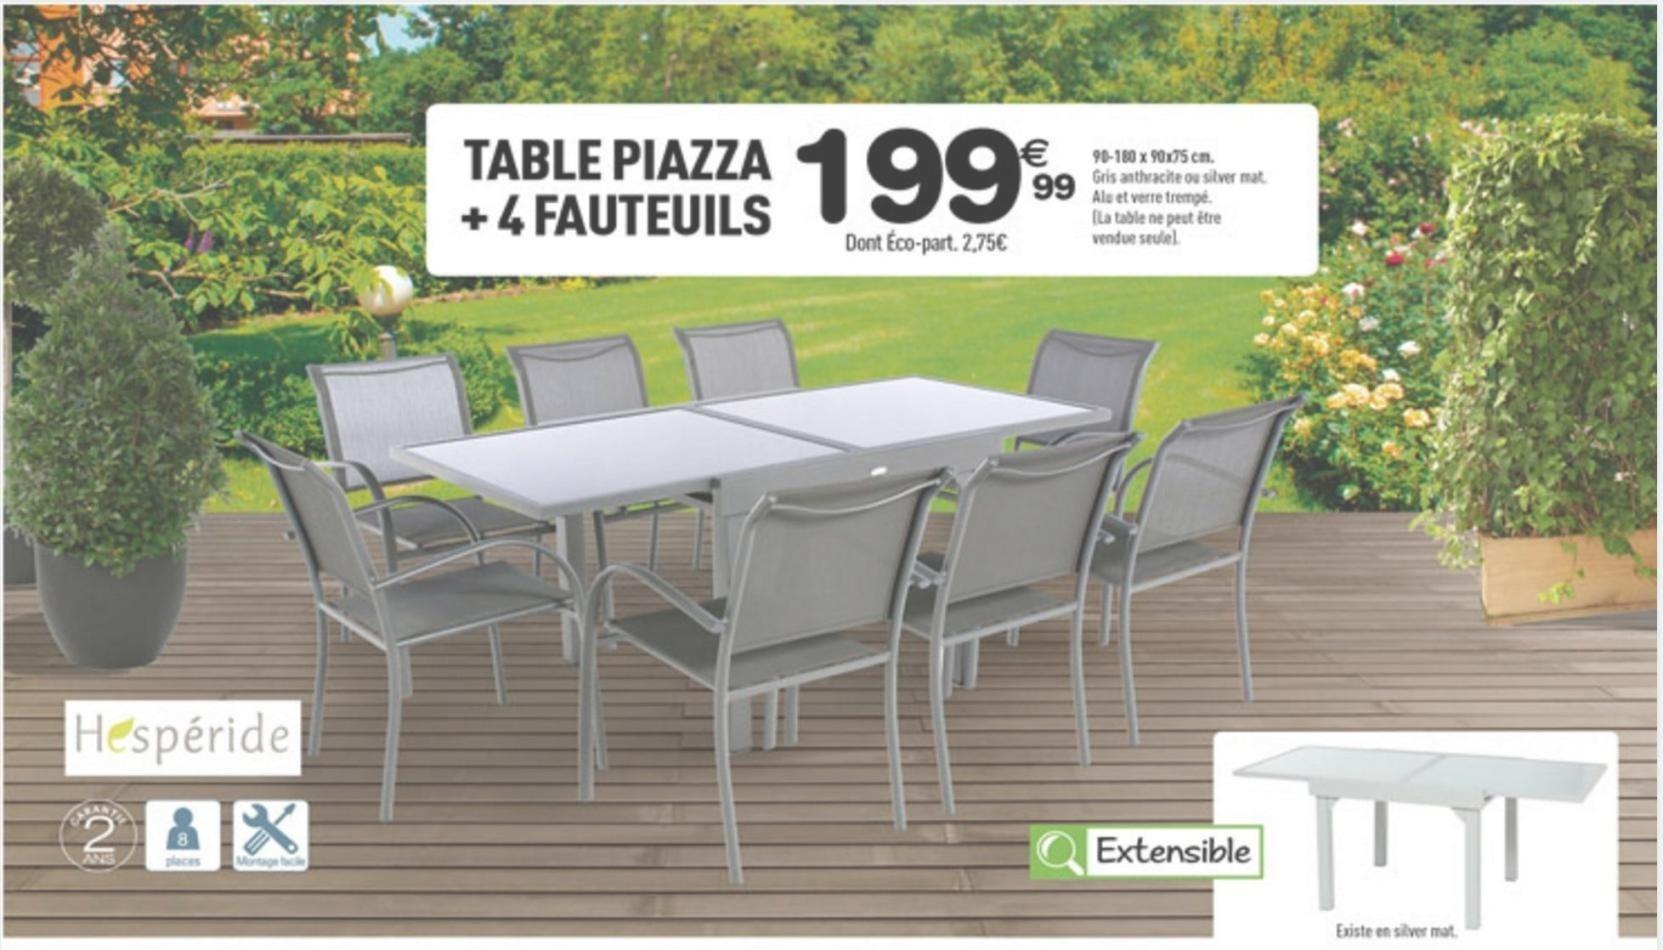 Table Centrakor Table De Table Centrakor De Hesperide ... tout Table Jardin Hesperide